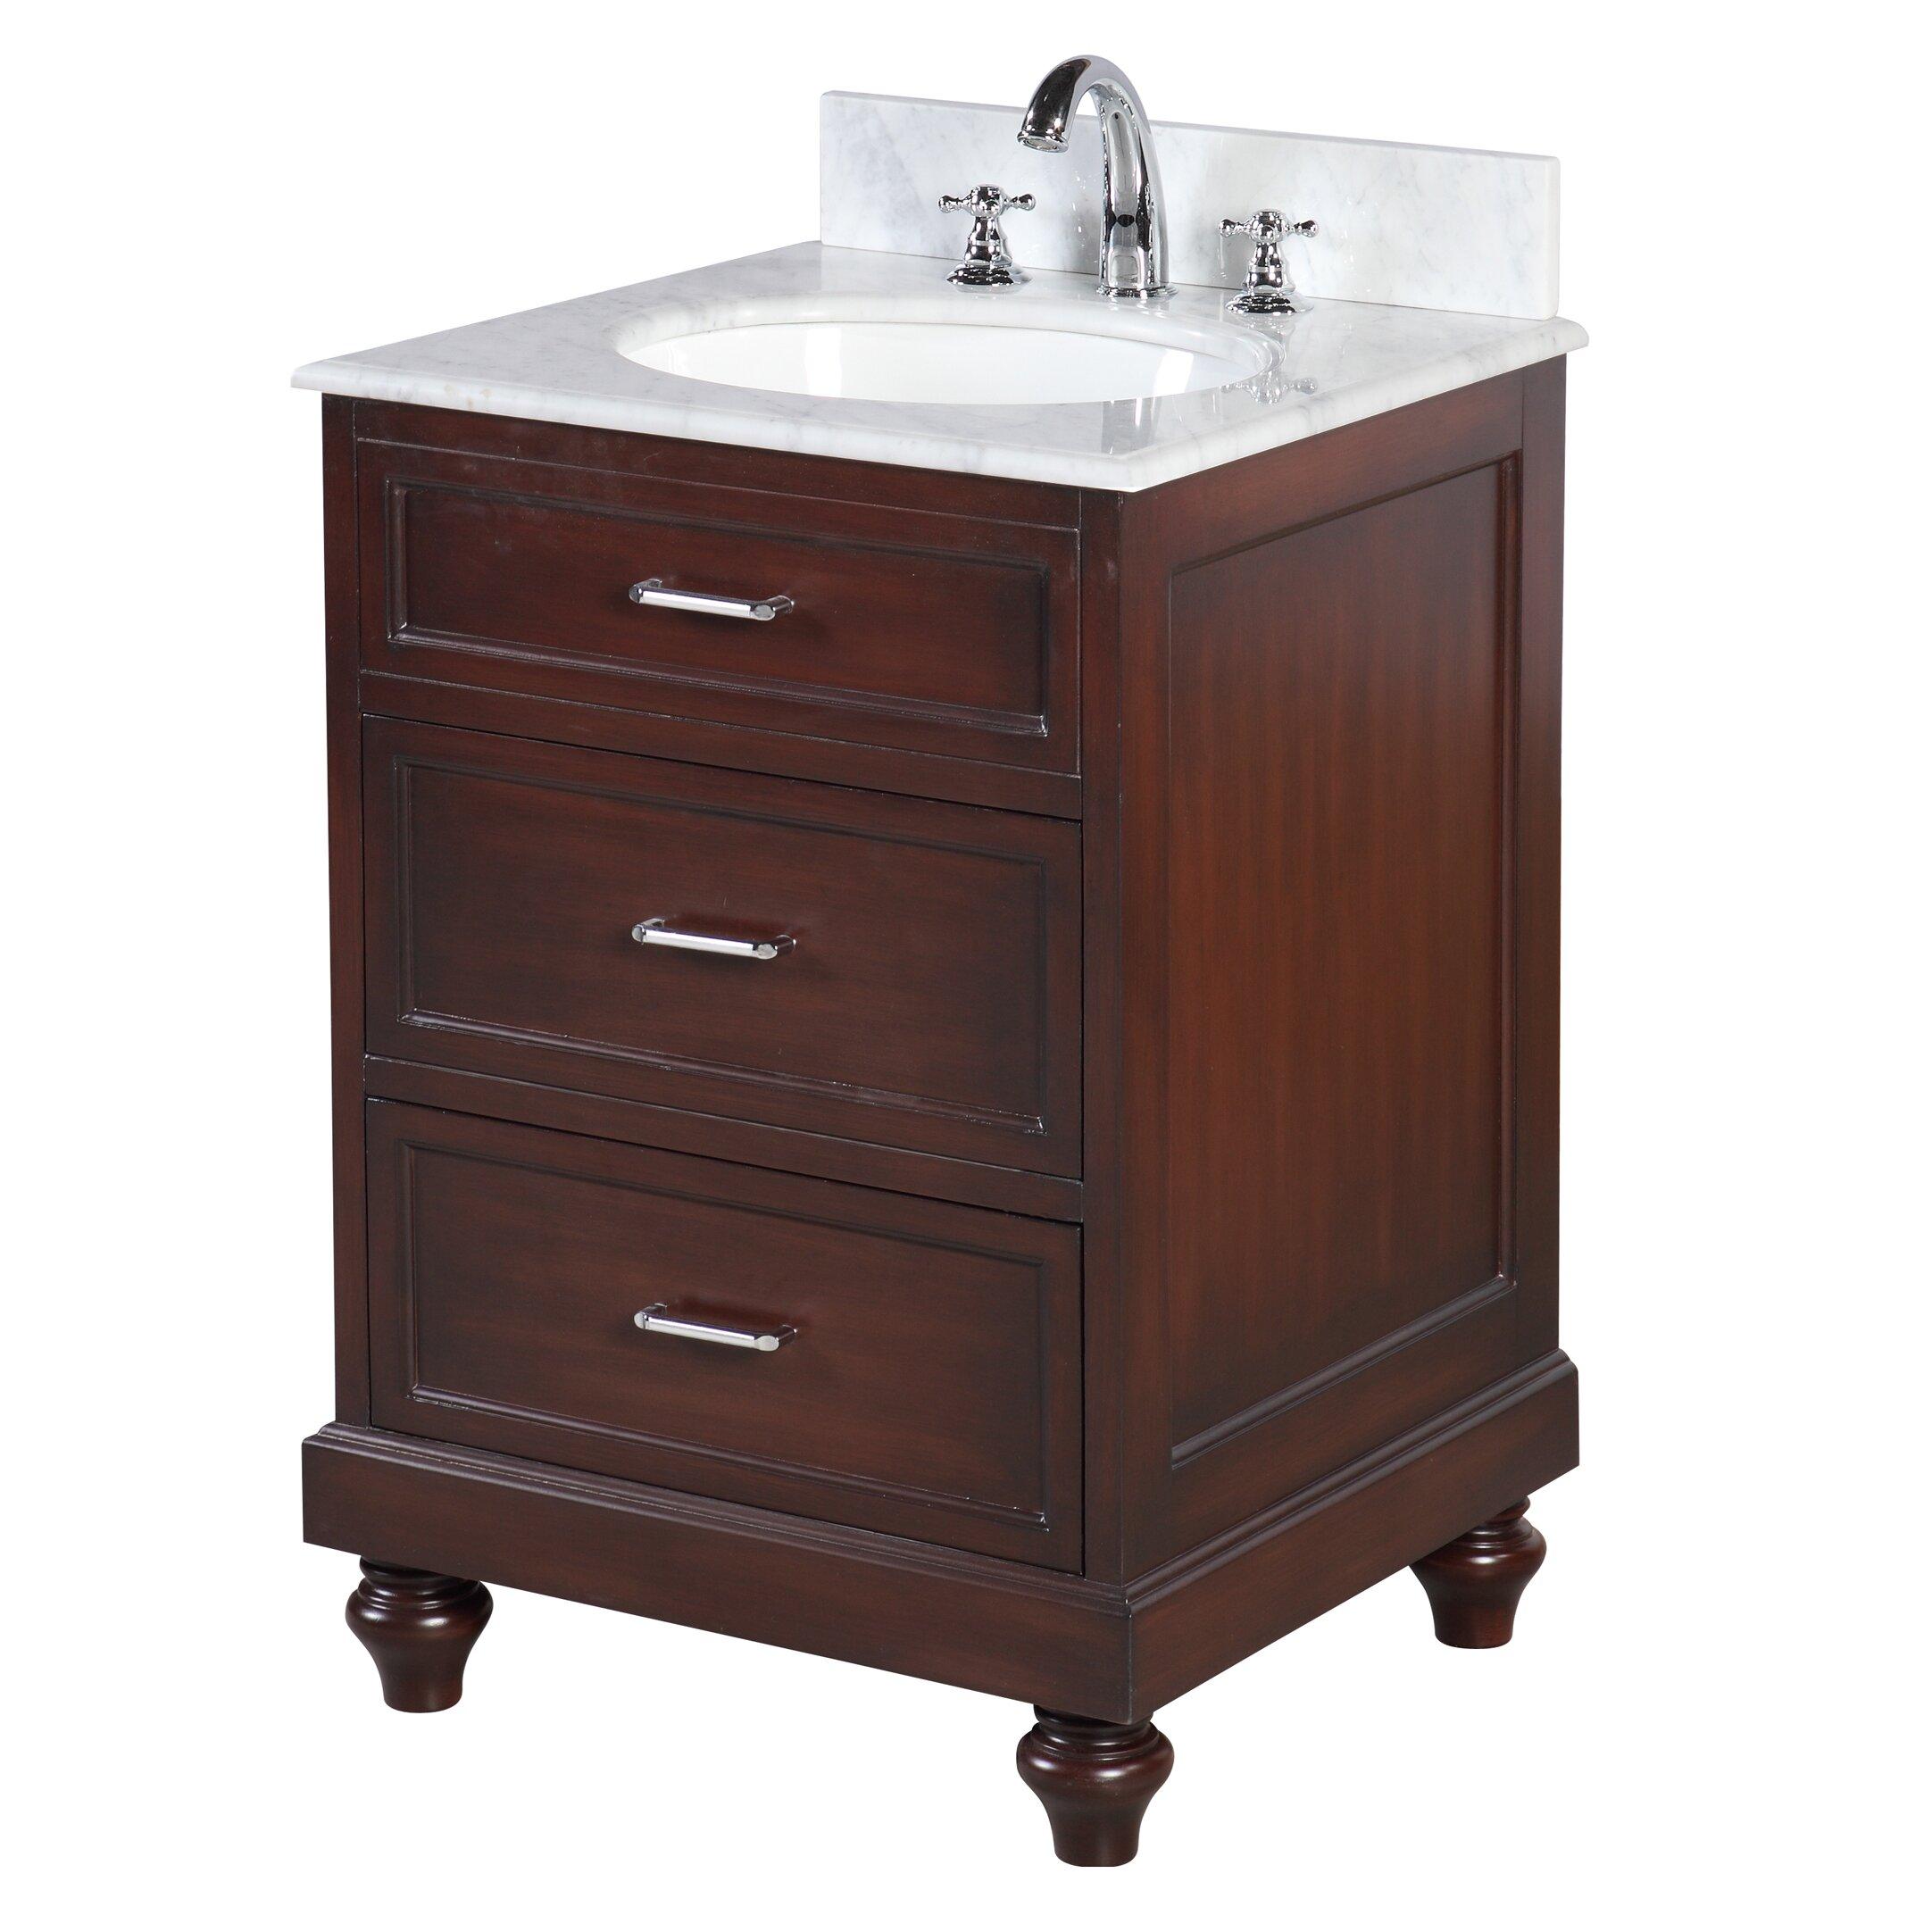 kbc amelia 24 single bathroom vanity set reviews wayfair. Black Bedroom Furniture Sets. Home Design Ideas